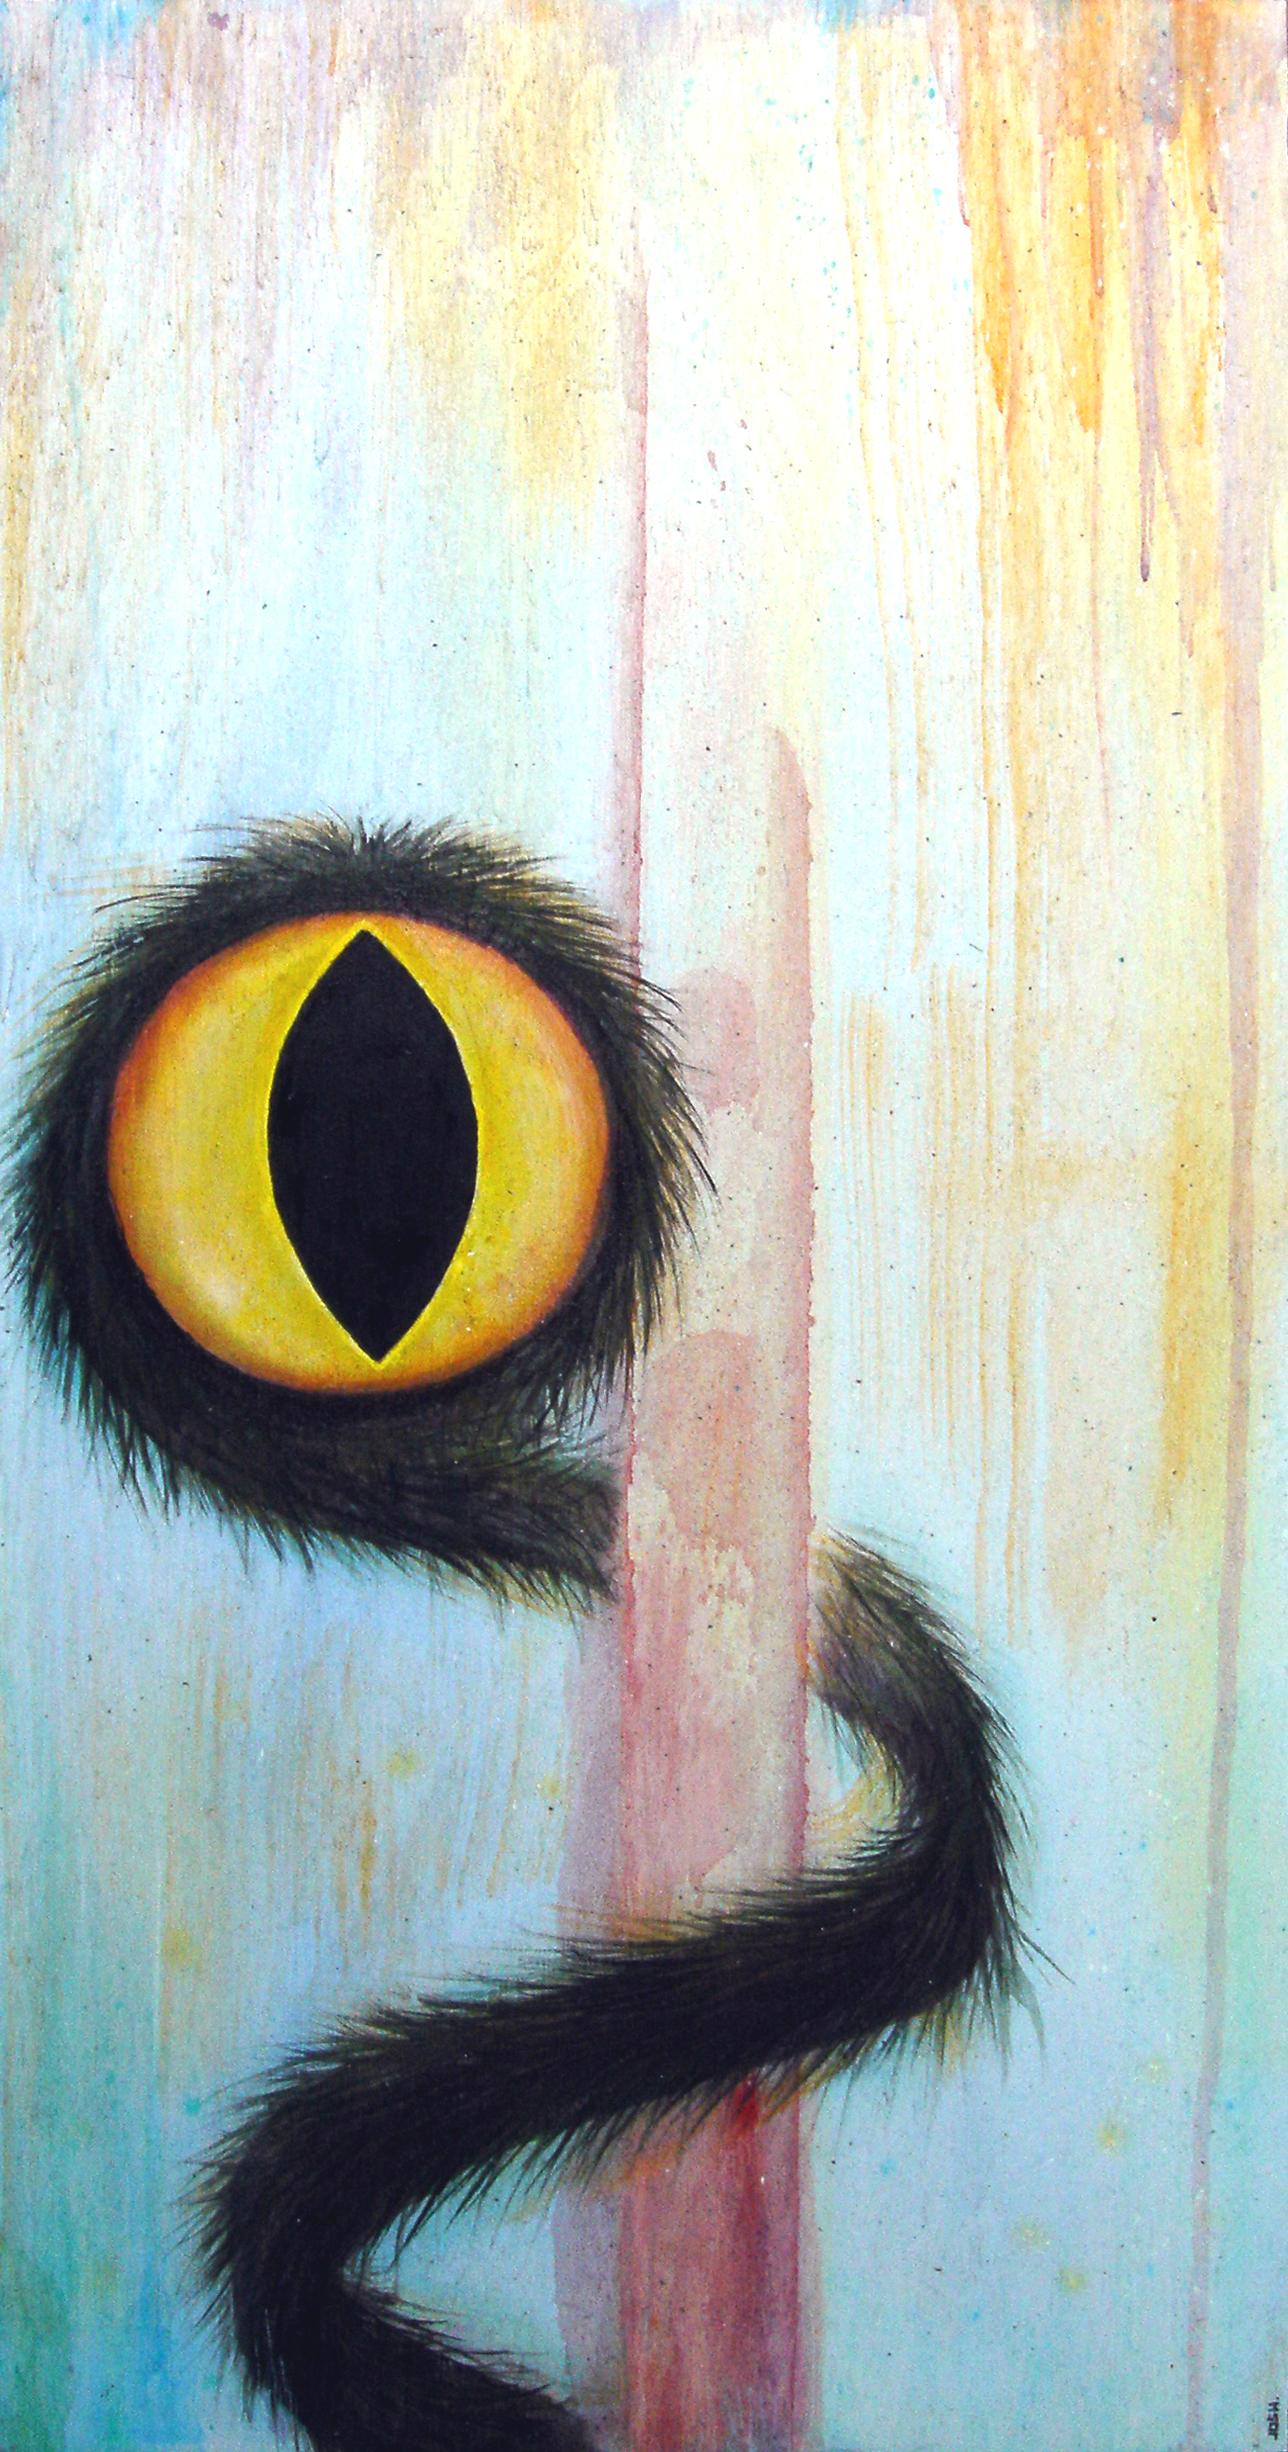 fuzzy-cat-eye-snake-worm